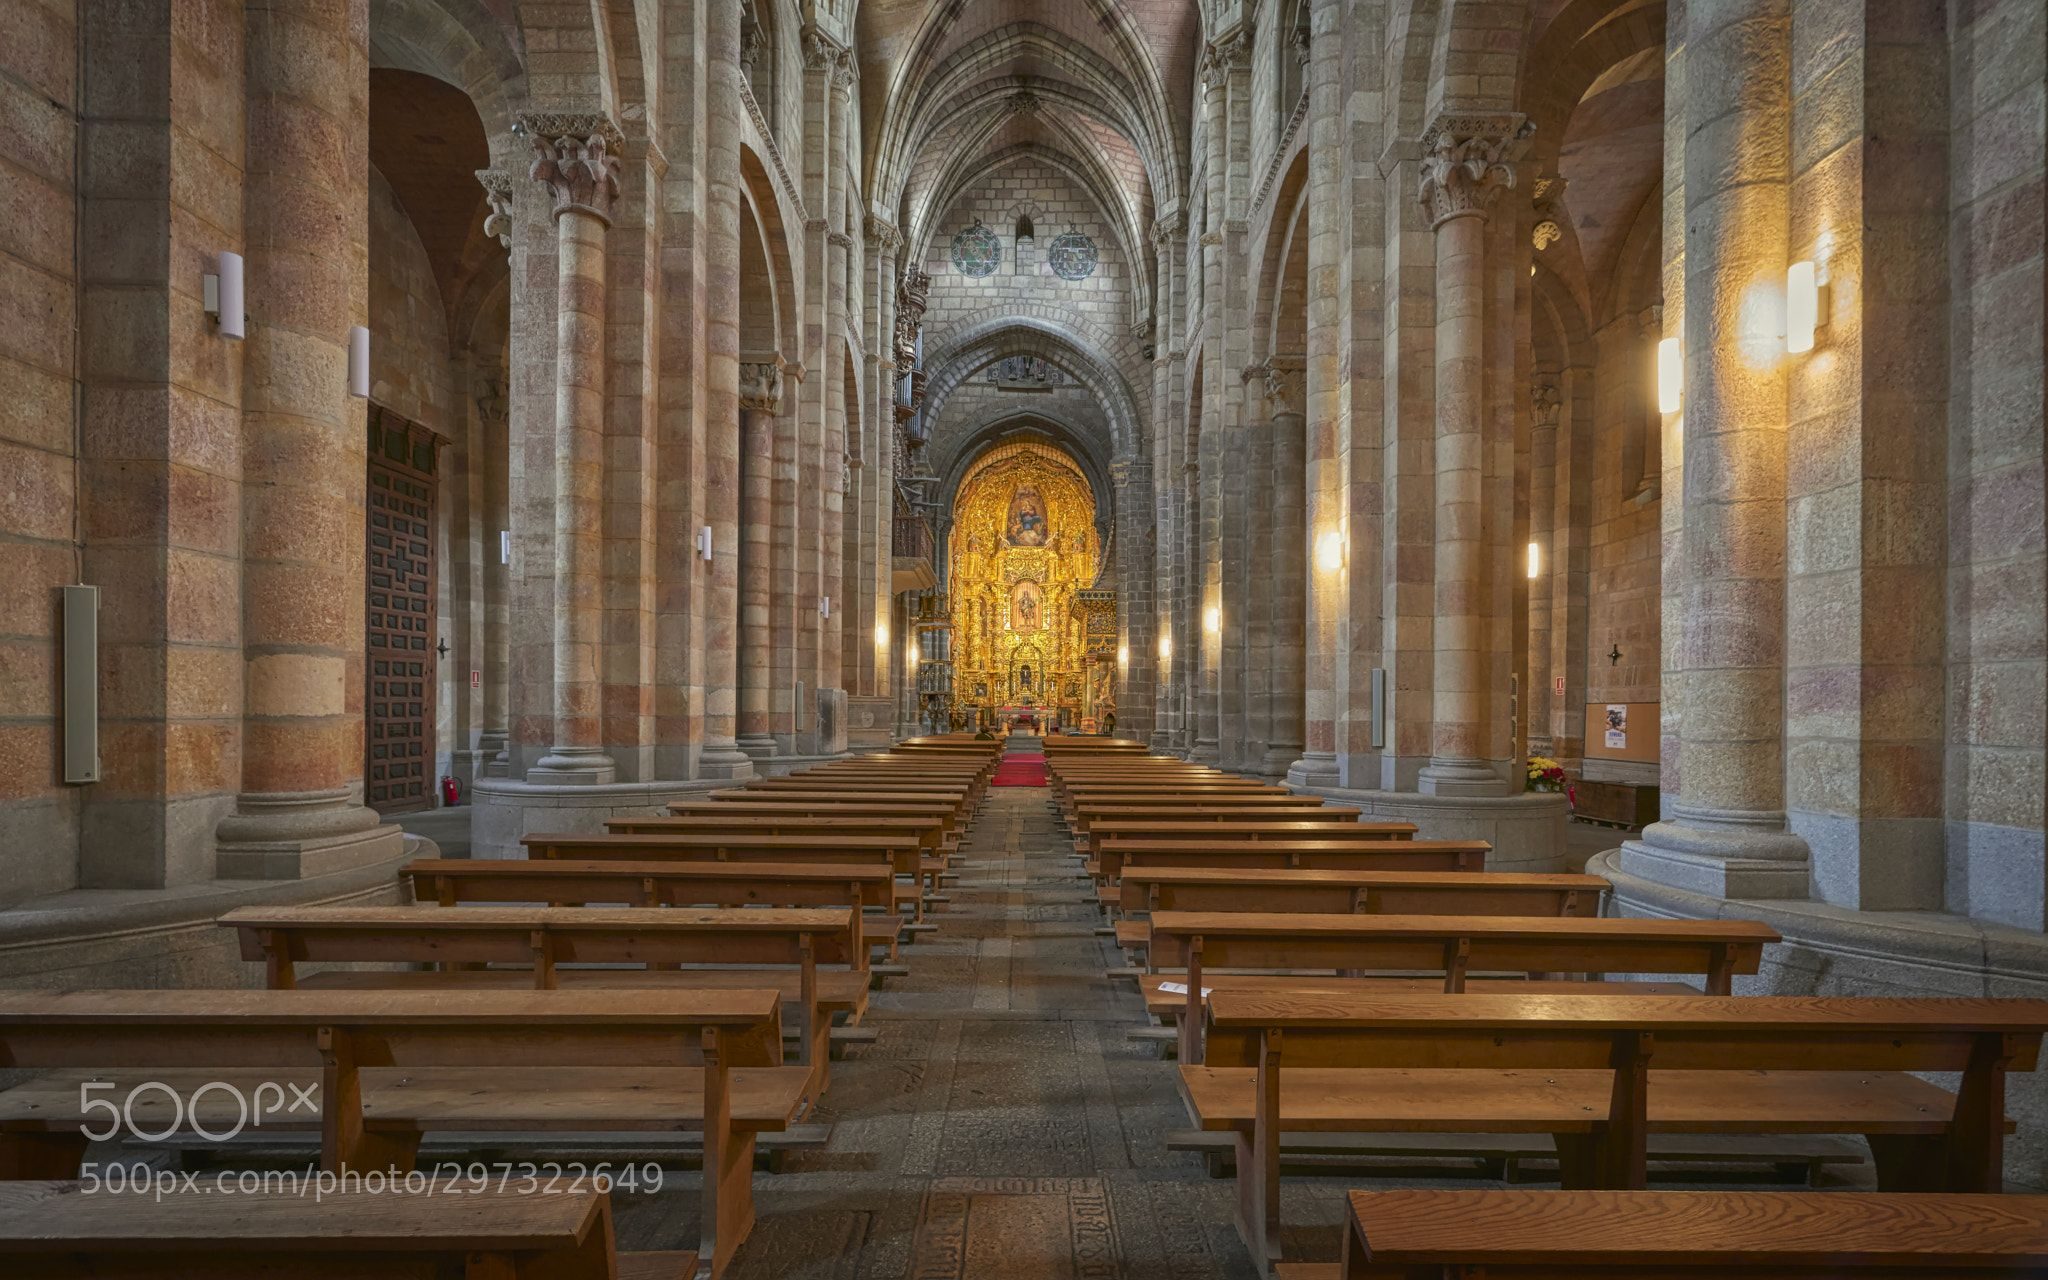 Basílica De San Vicente ávila By Neobit San Vicente Romanesque Architecture Cathedral Church